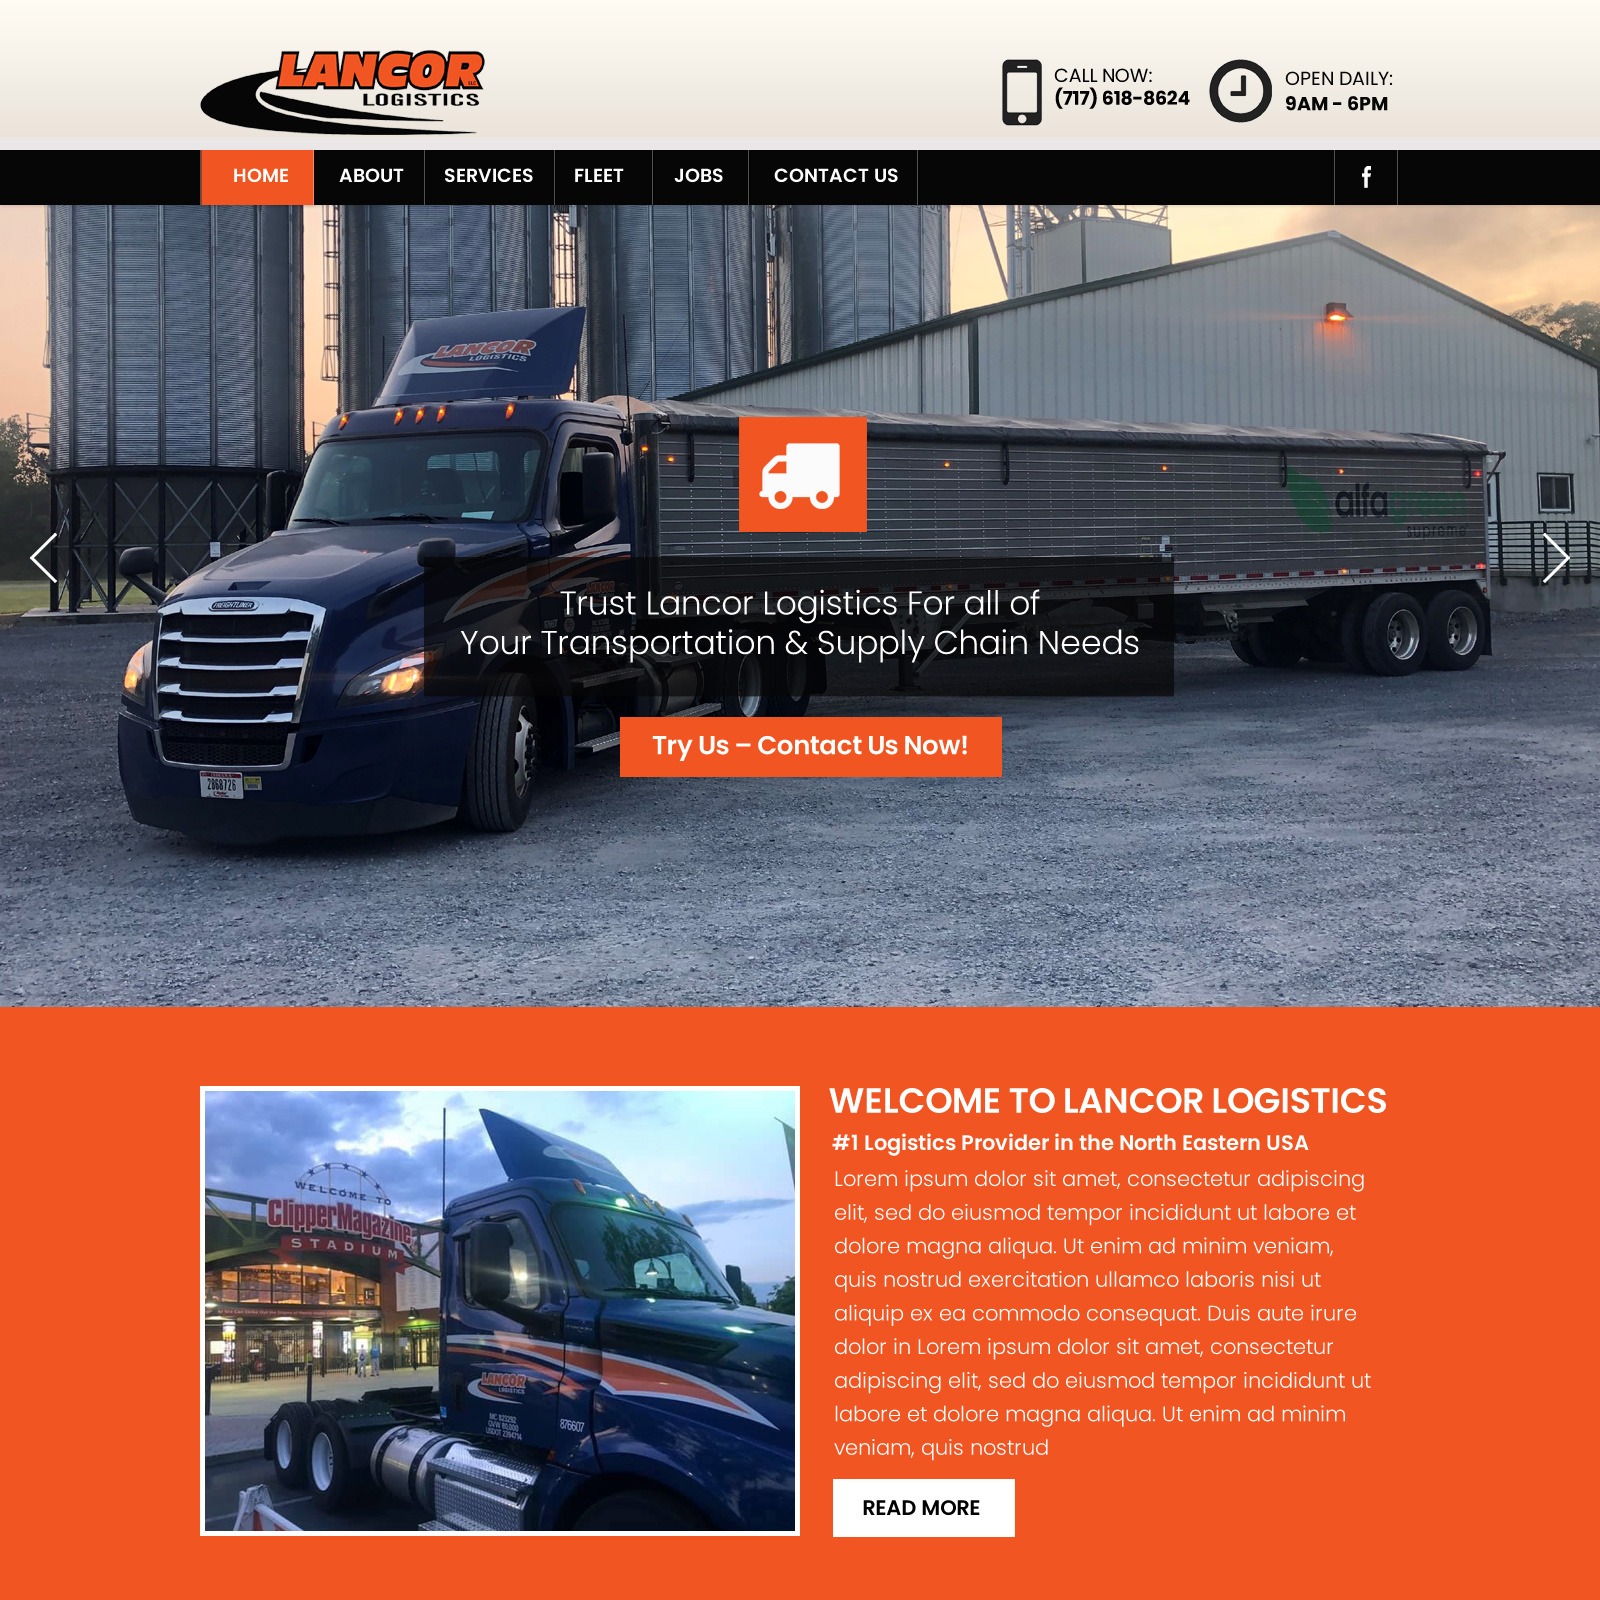 Lancor Logistics - trucking company website design